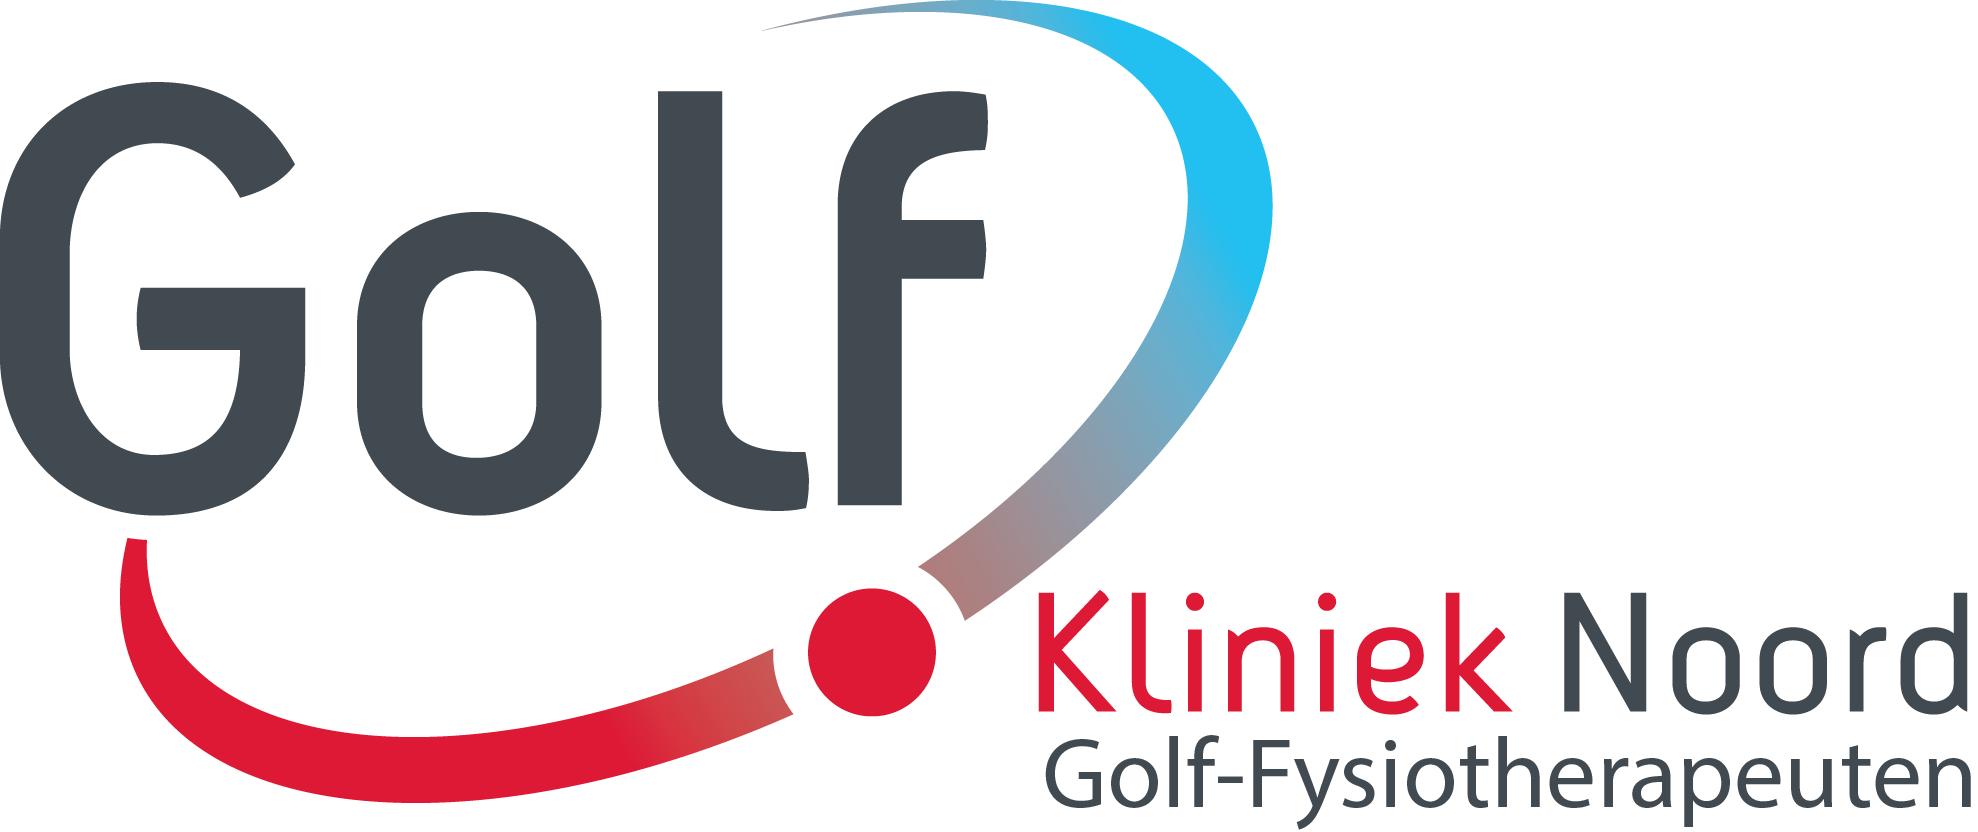 Golfkliniek